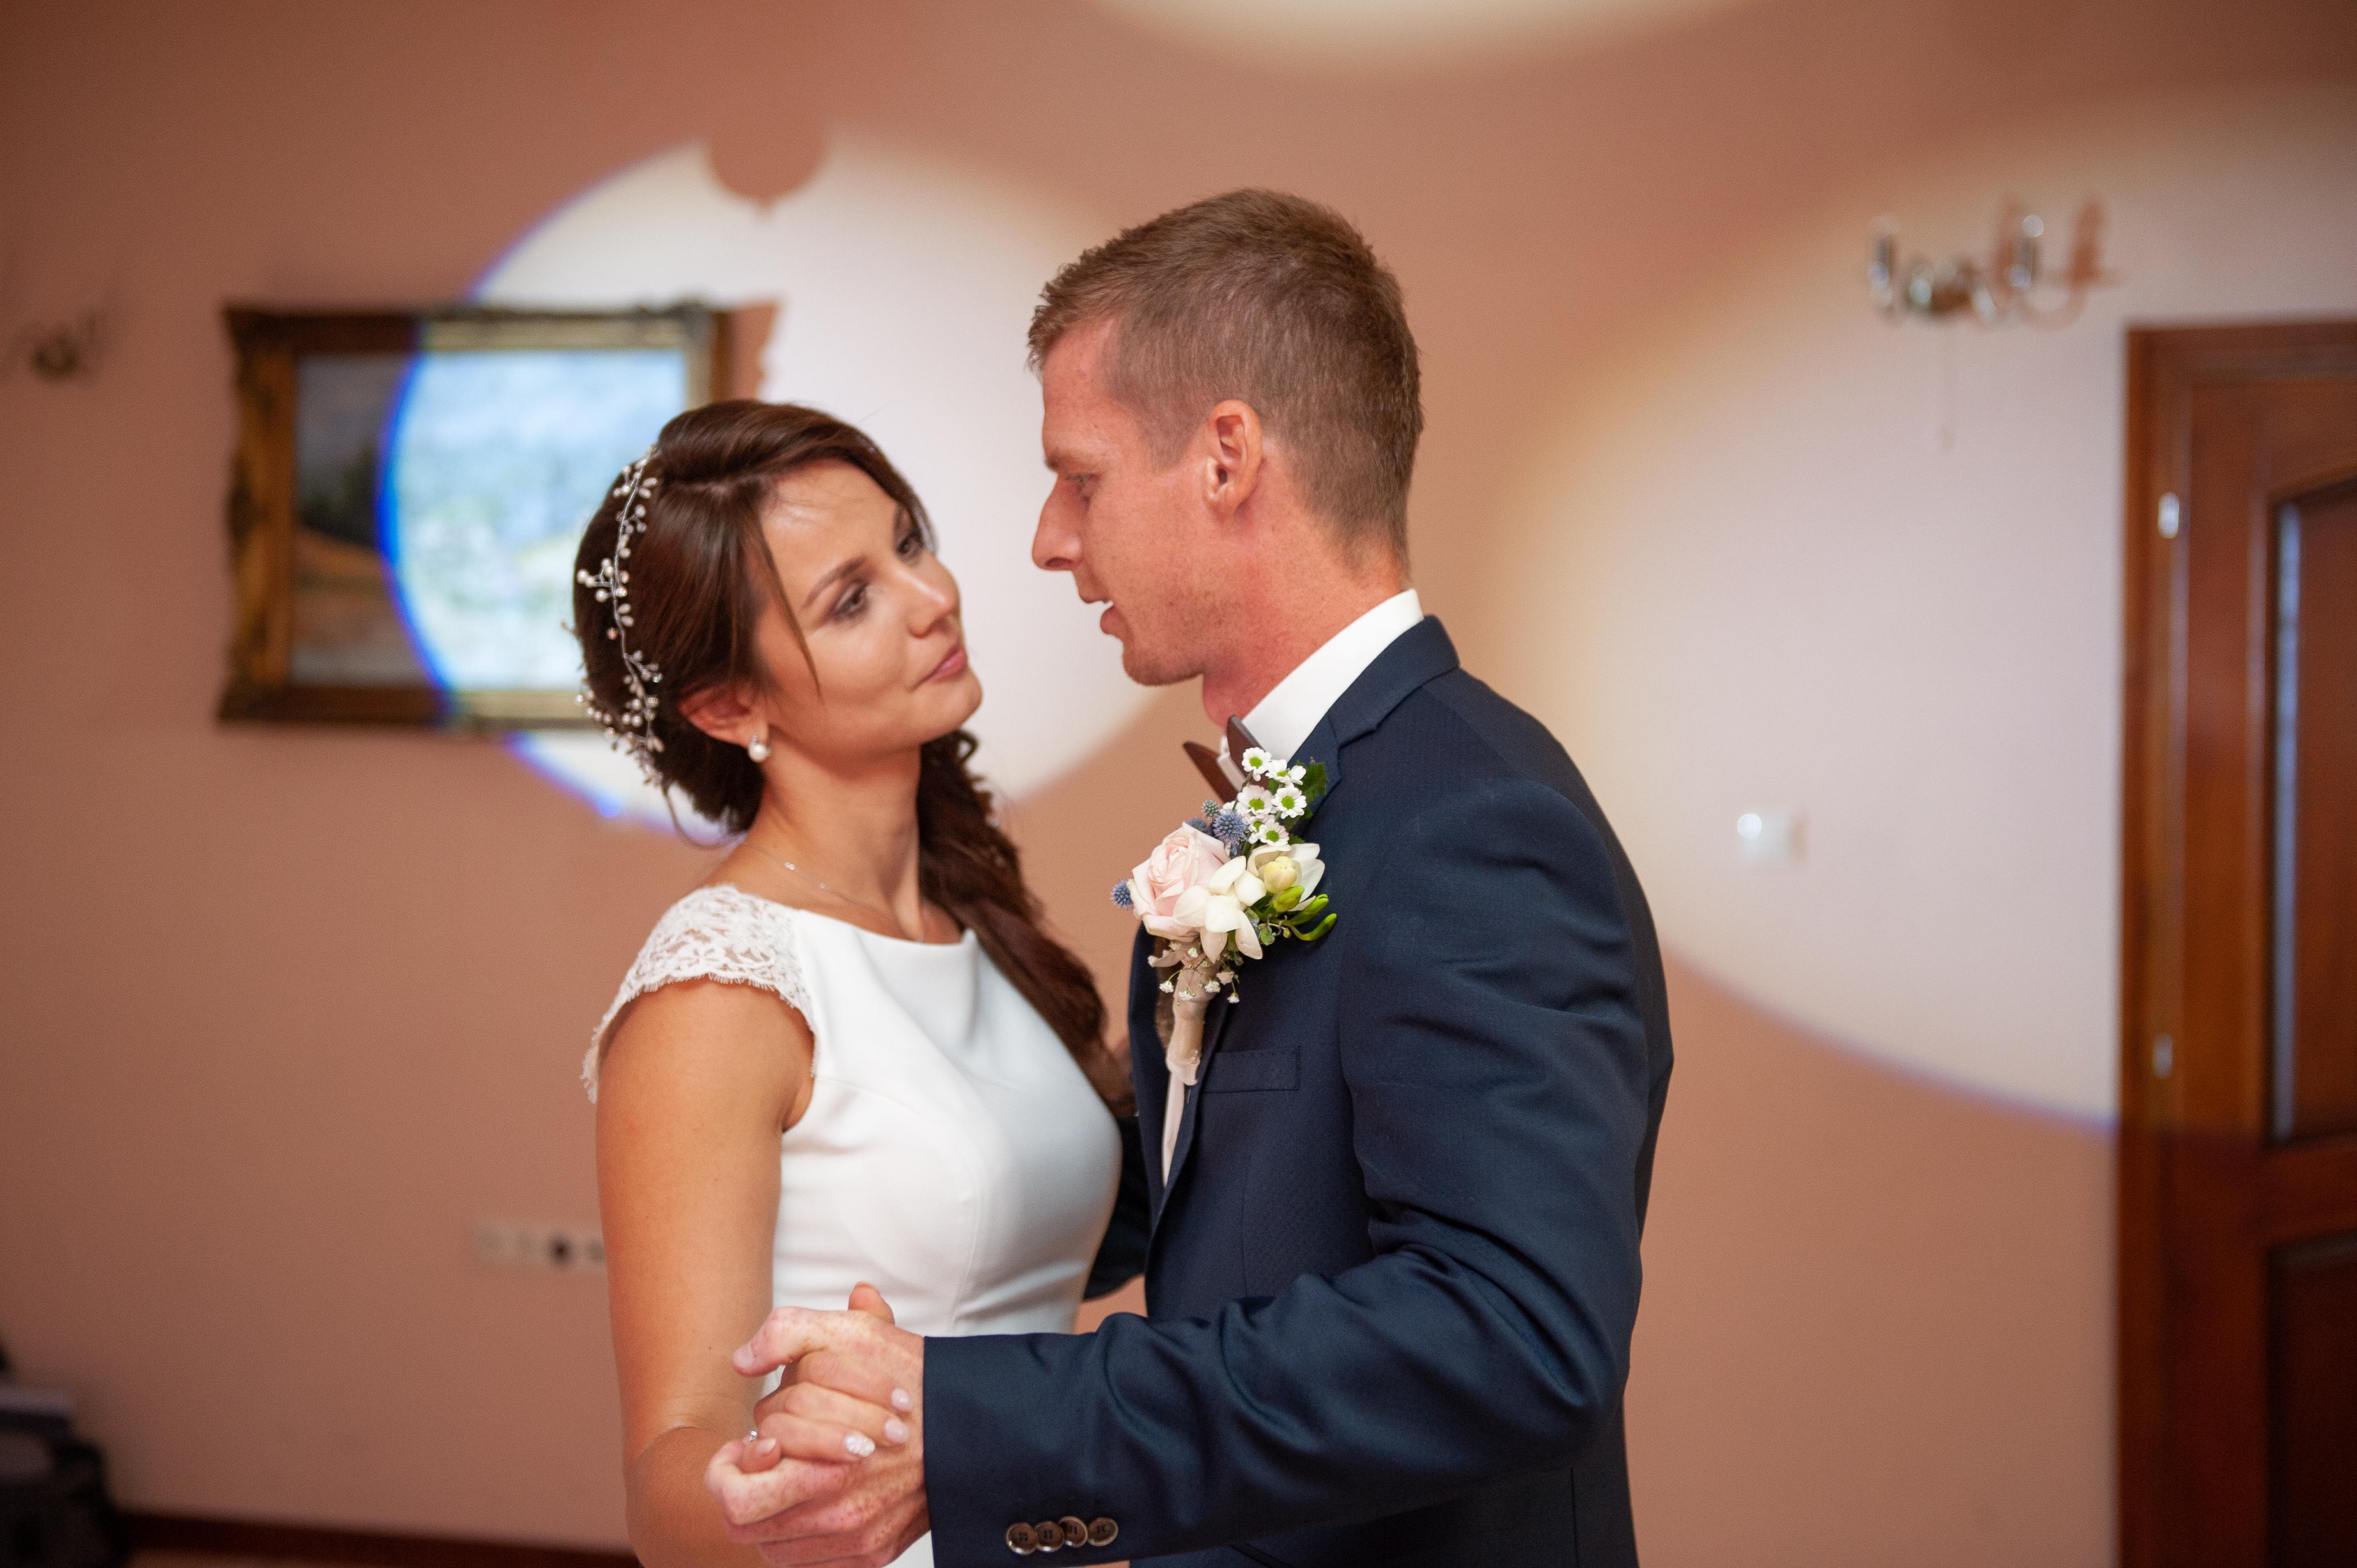 Svadba St. Petrus, Svätý Peter 02 #svadobnyDJ, #djanasvadbu, #svadba, #stpetrusvini